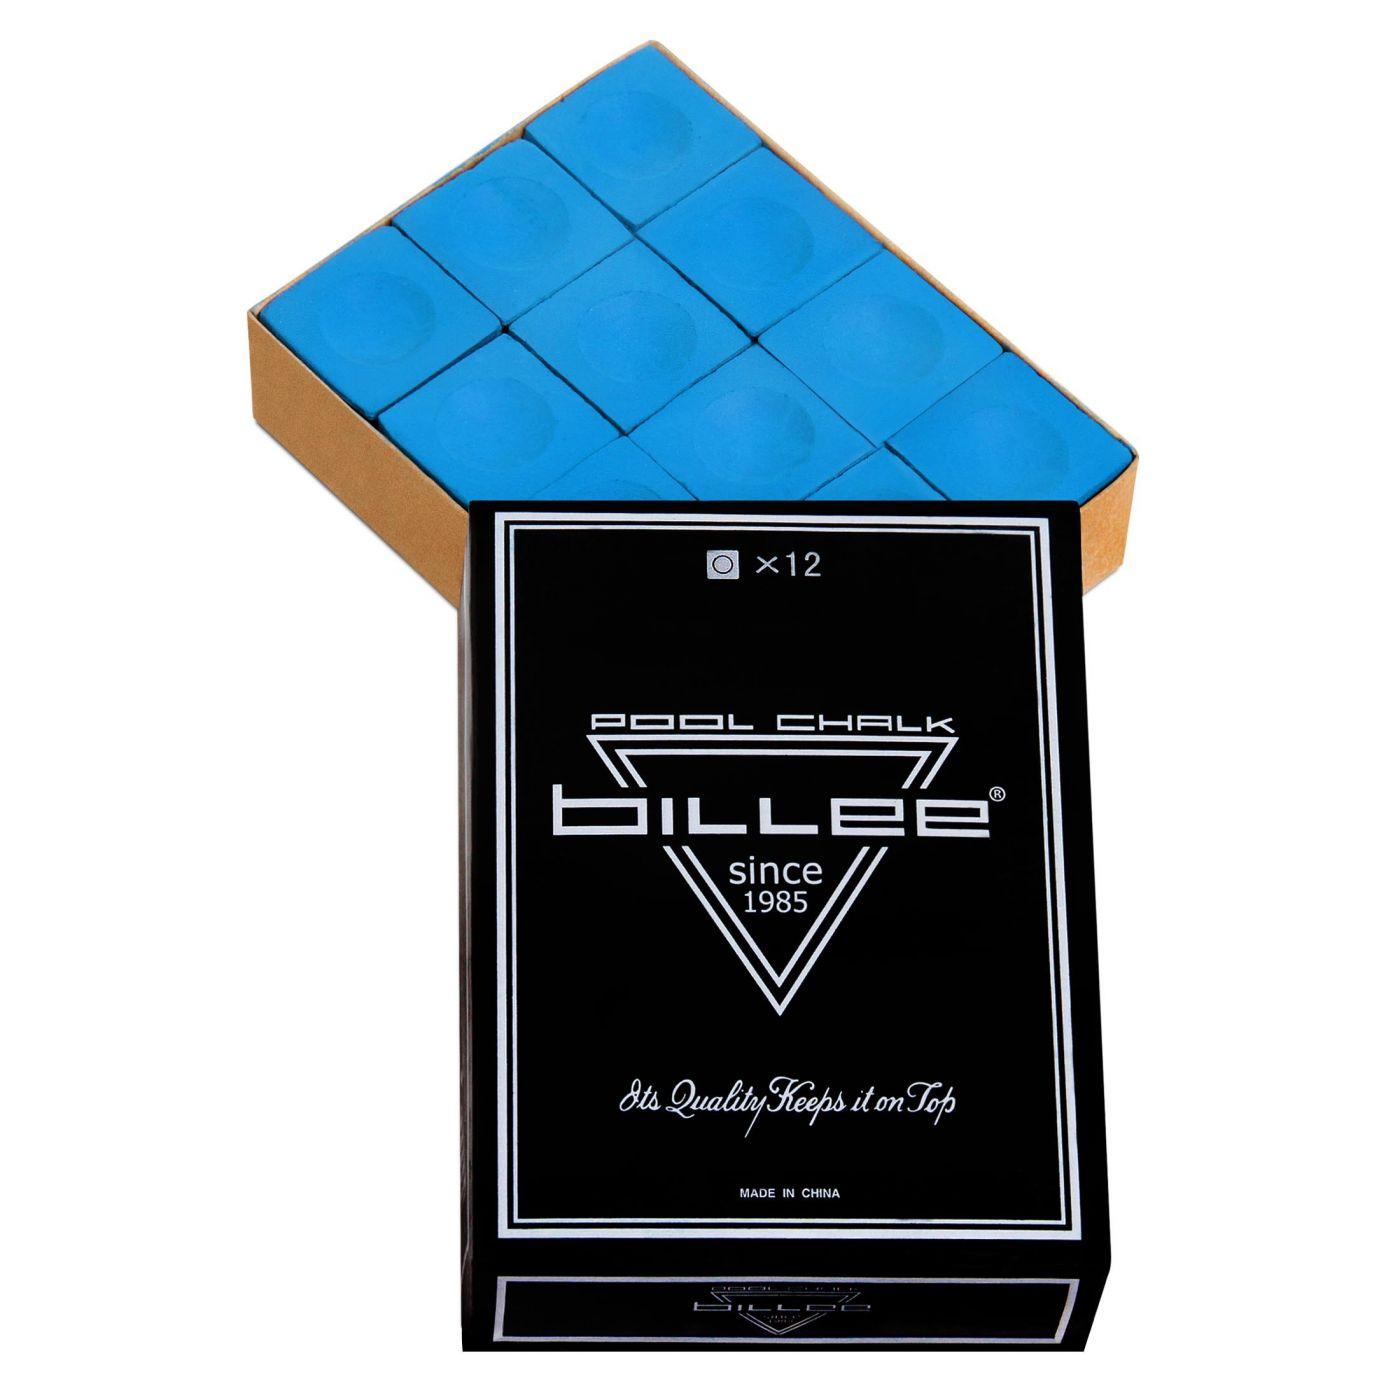 МЕЛ BILLEE BLUE 12ШТ. 04302